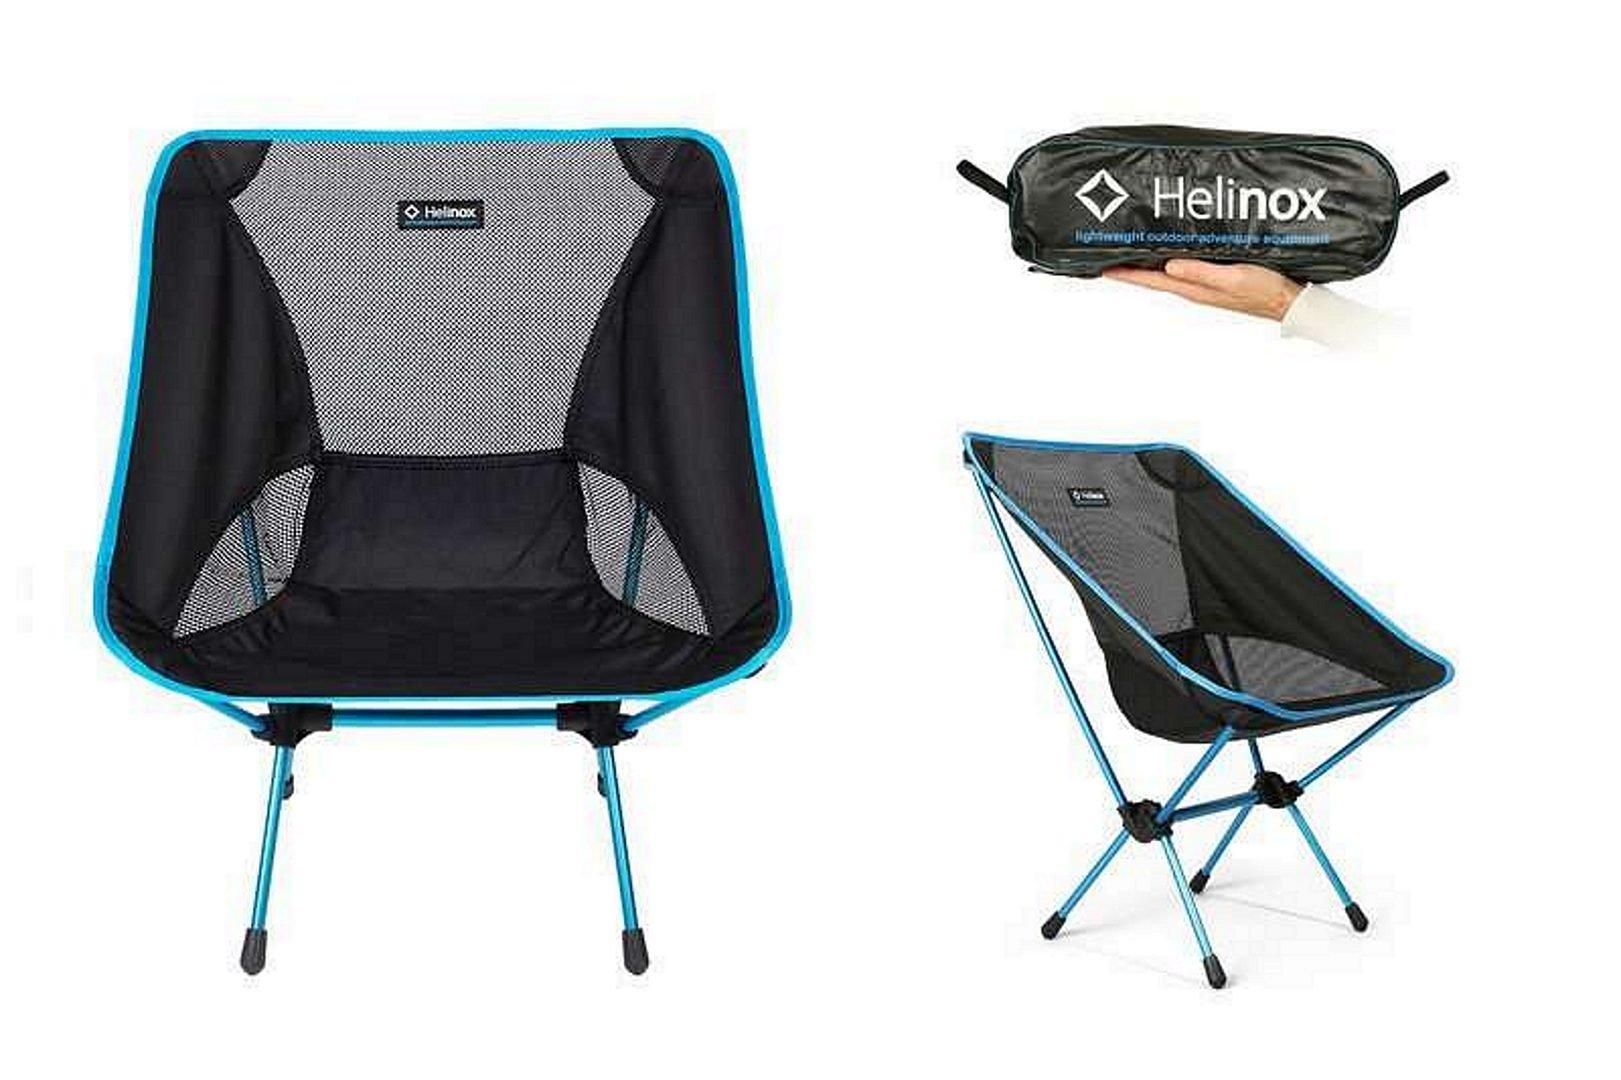 Helinox ONE Original Lightweight Camping Chair